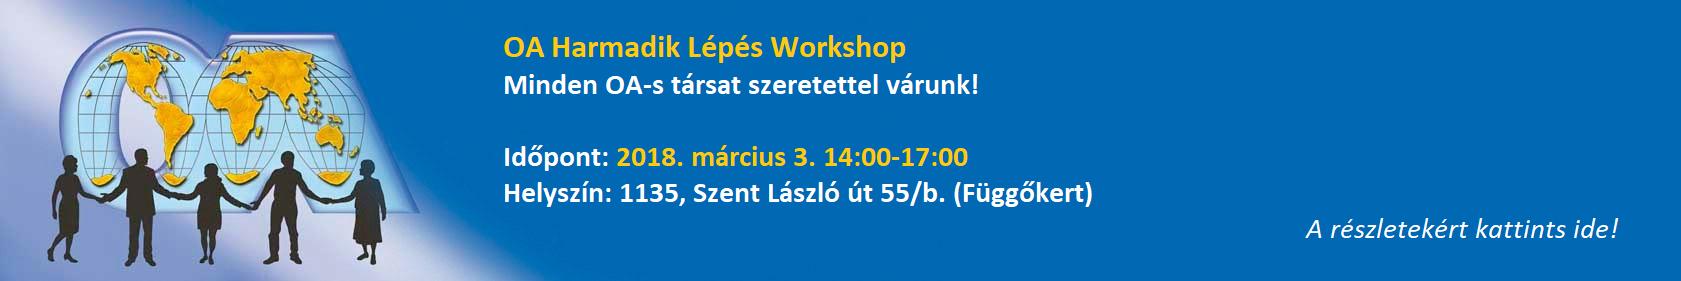 OA Workshop